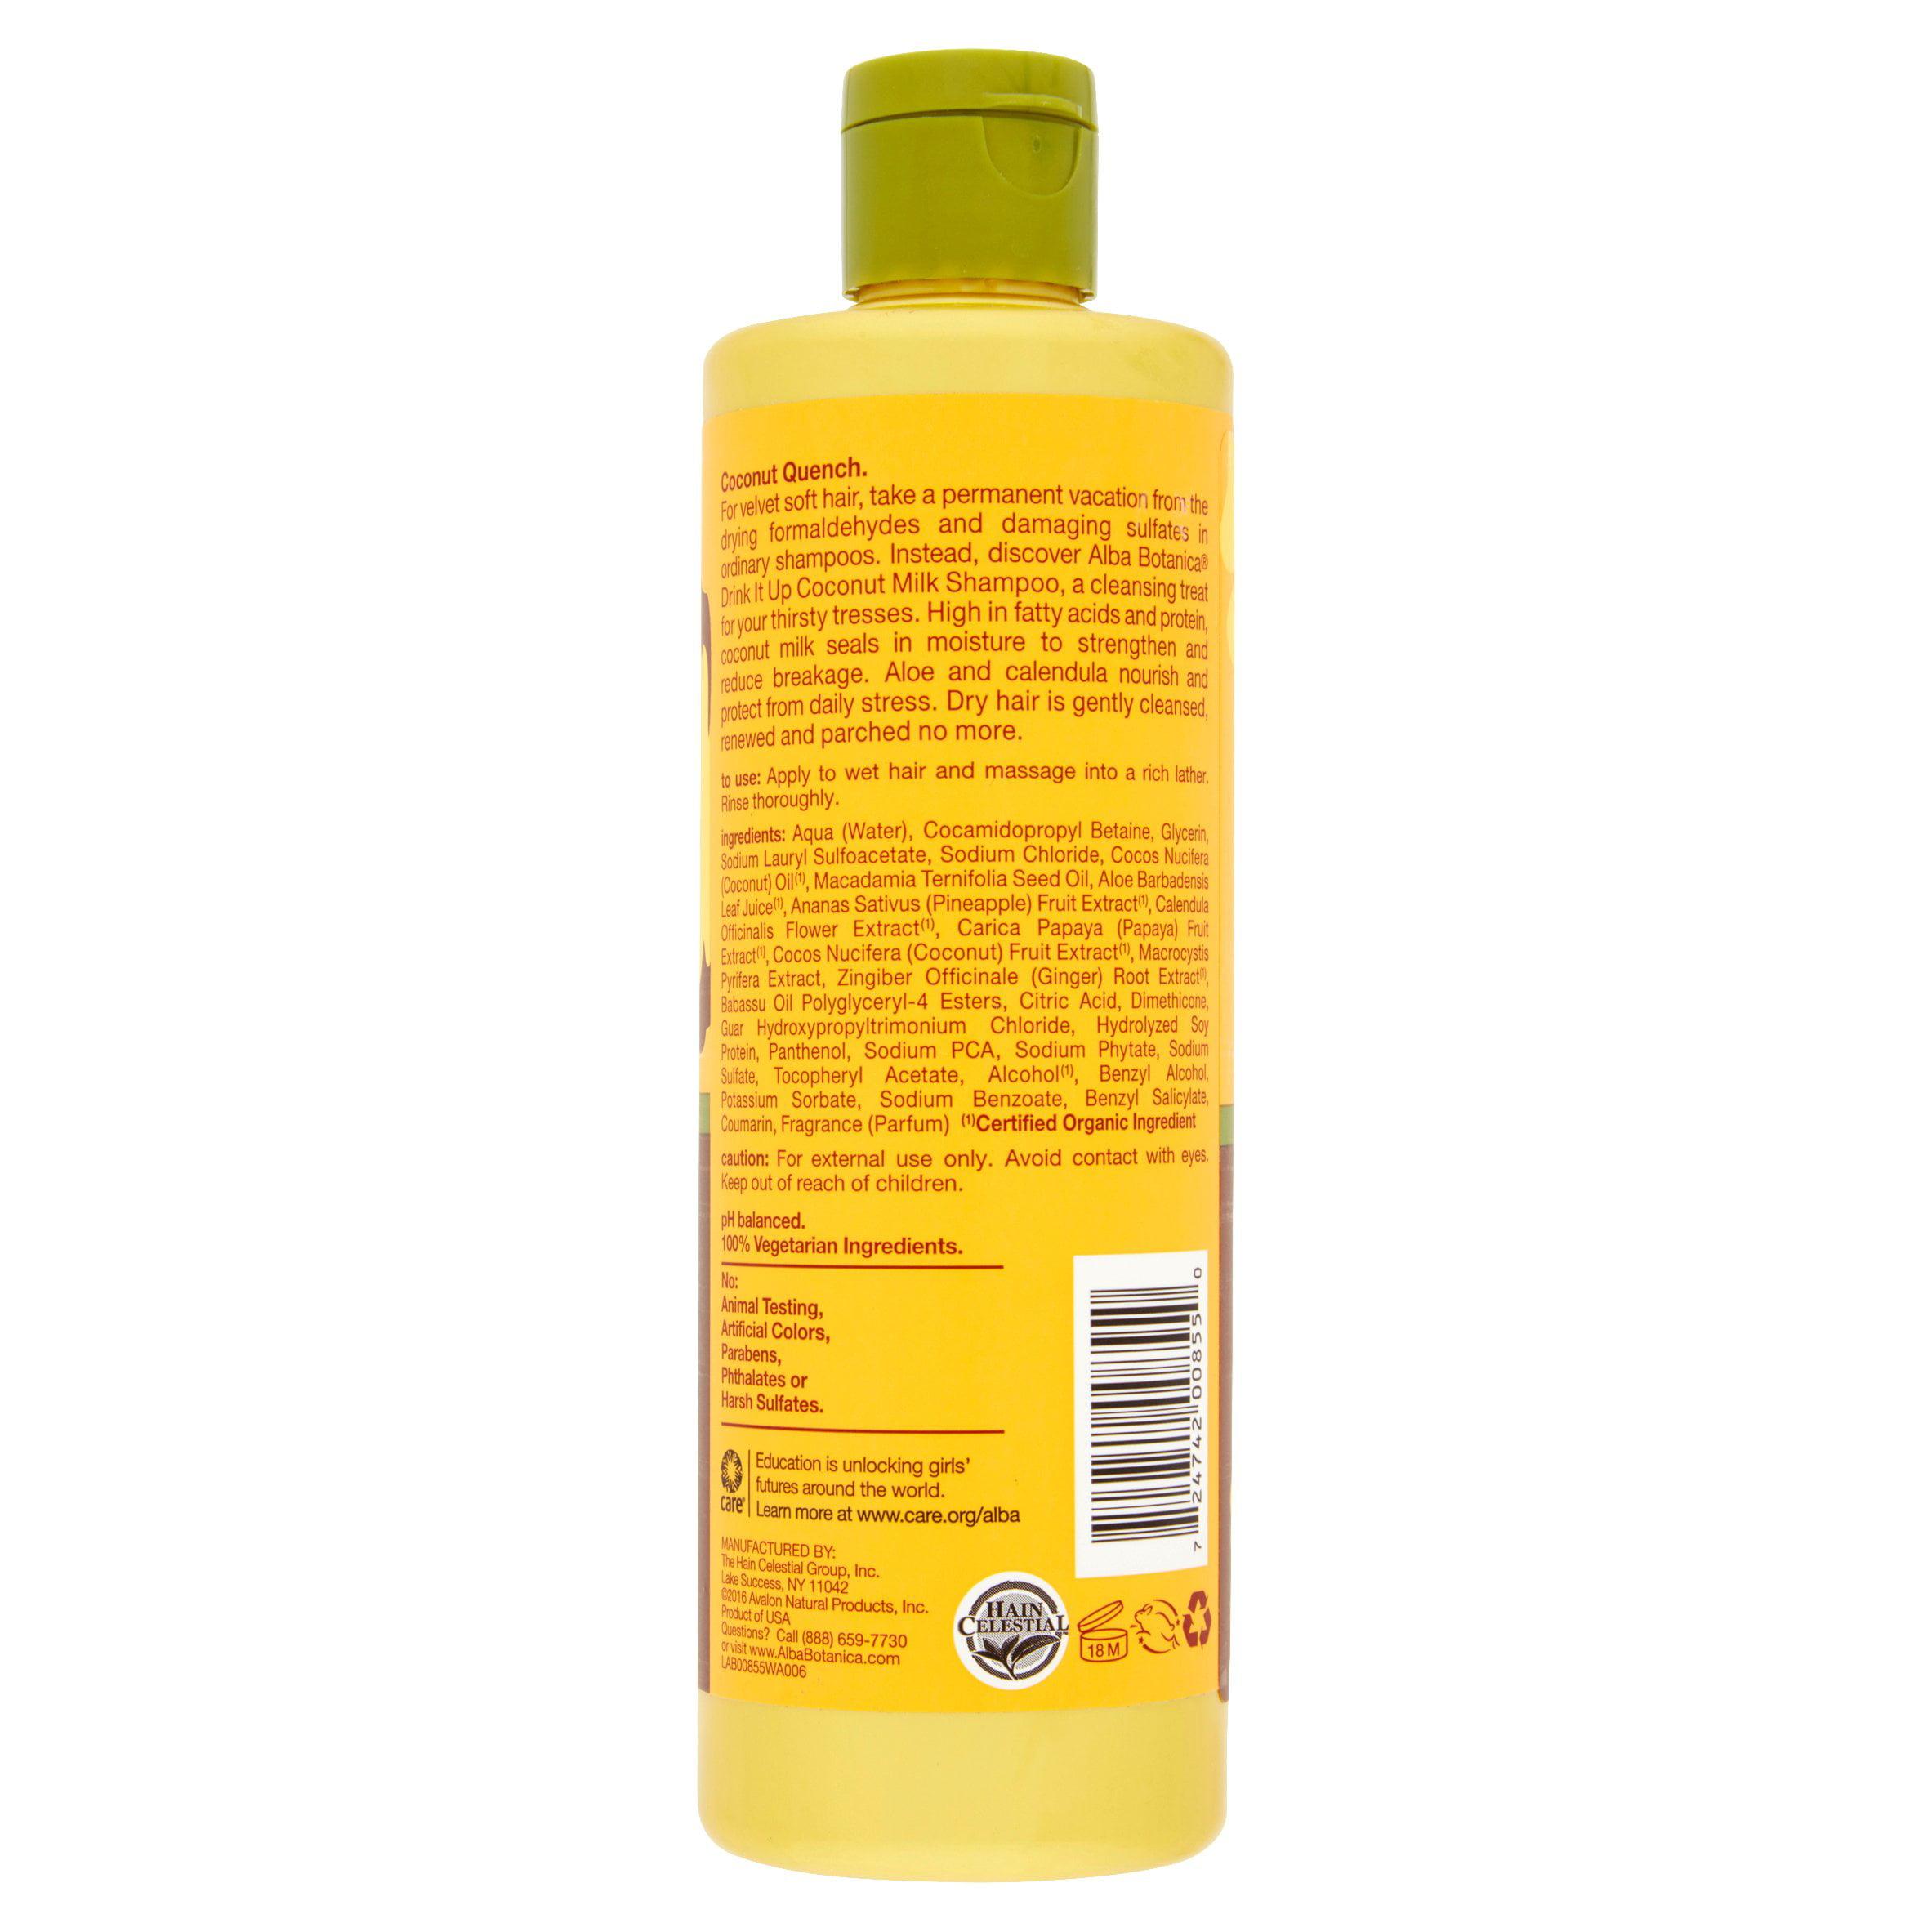 Alba Botanica Hawaiian Moisturizing Shampoo Coconut Milk 12 oz